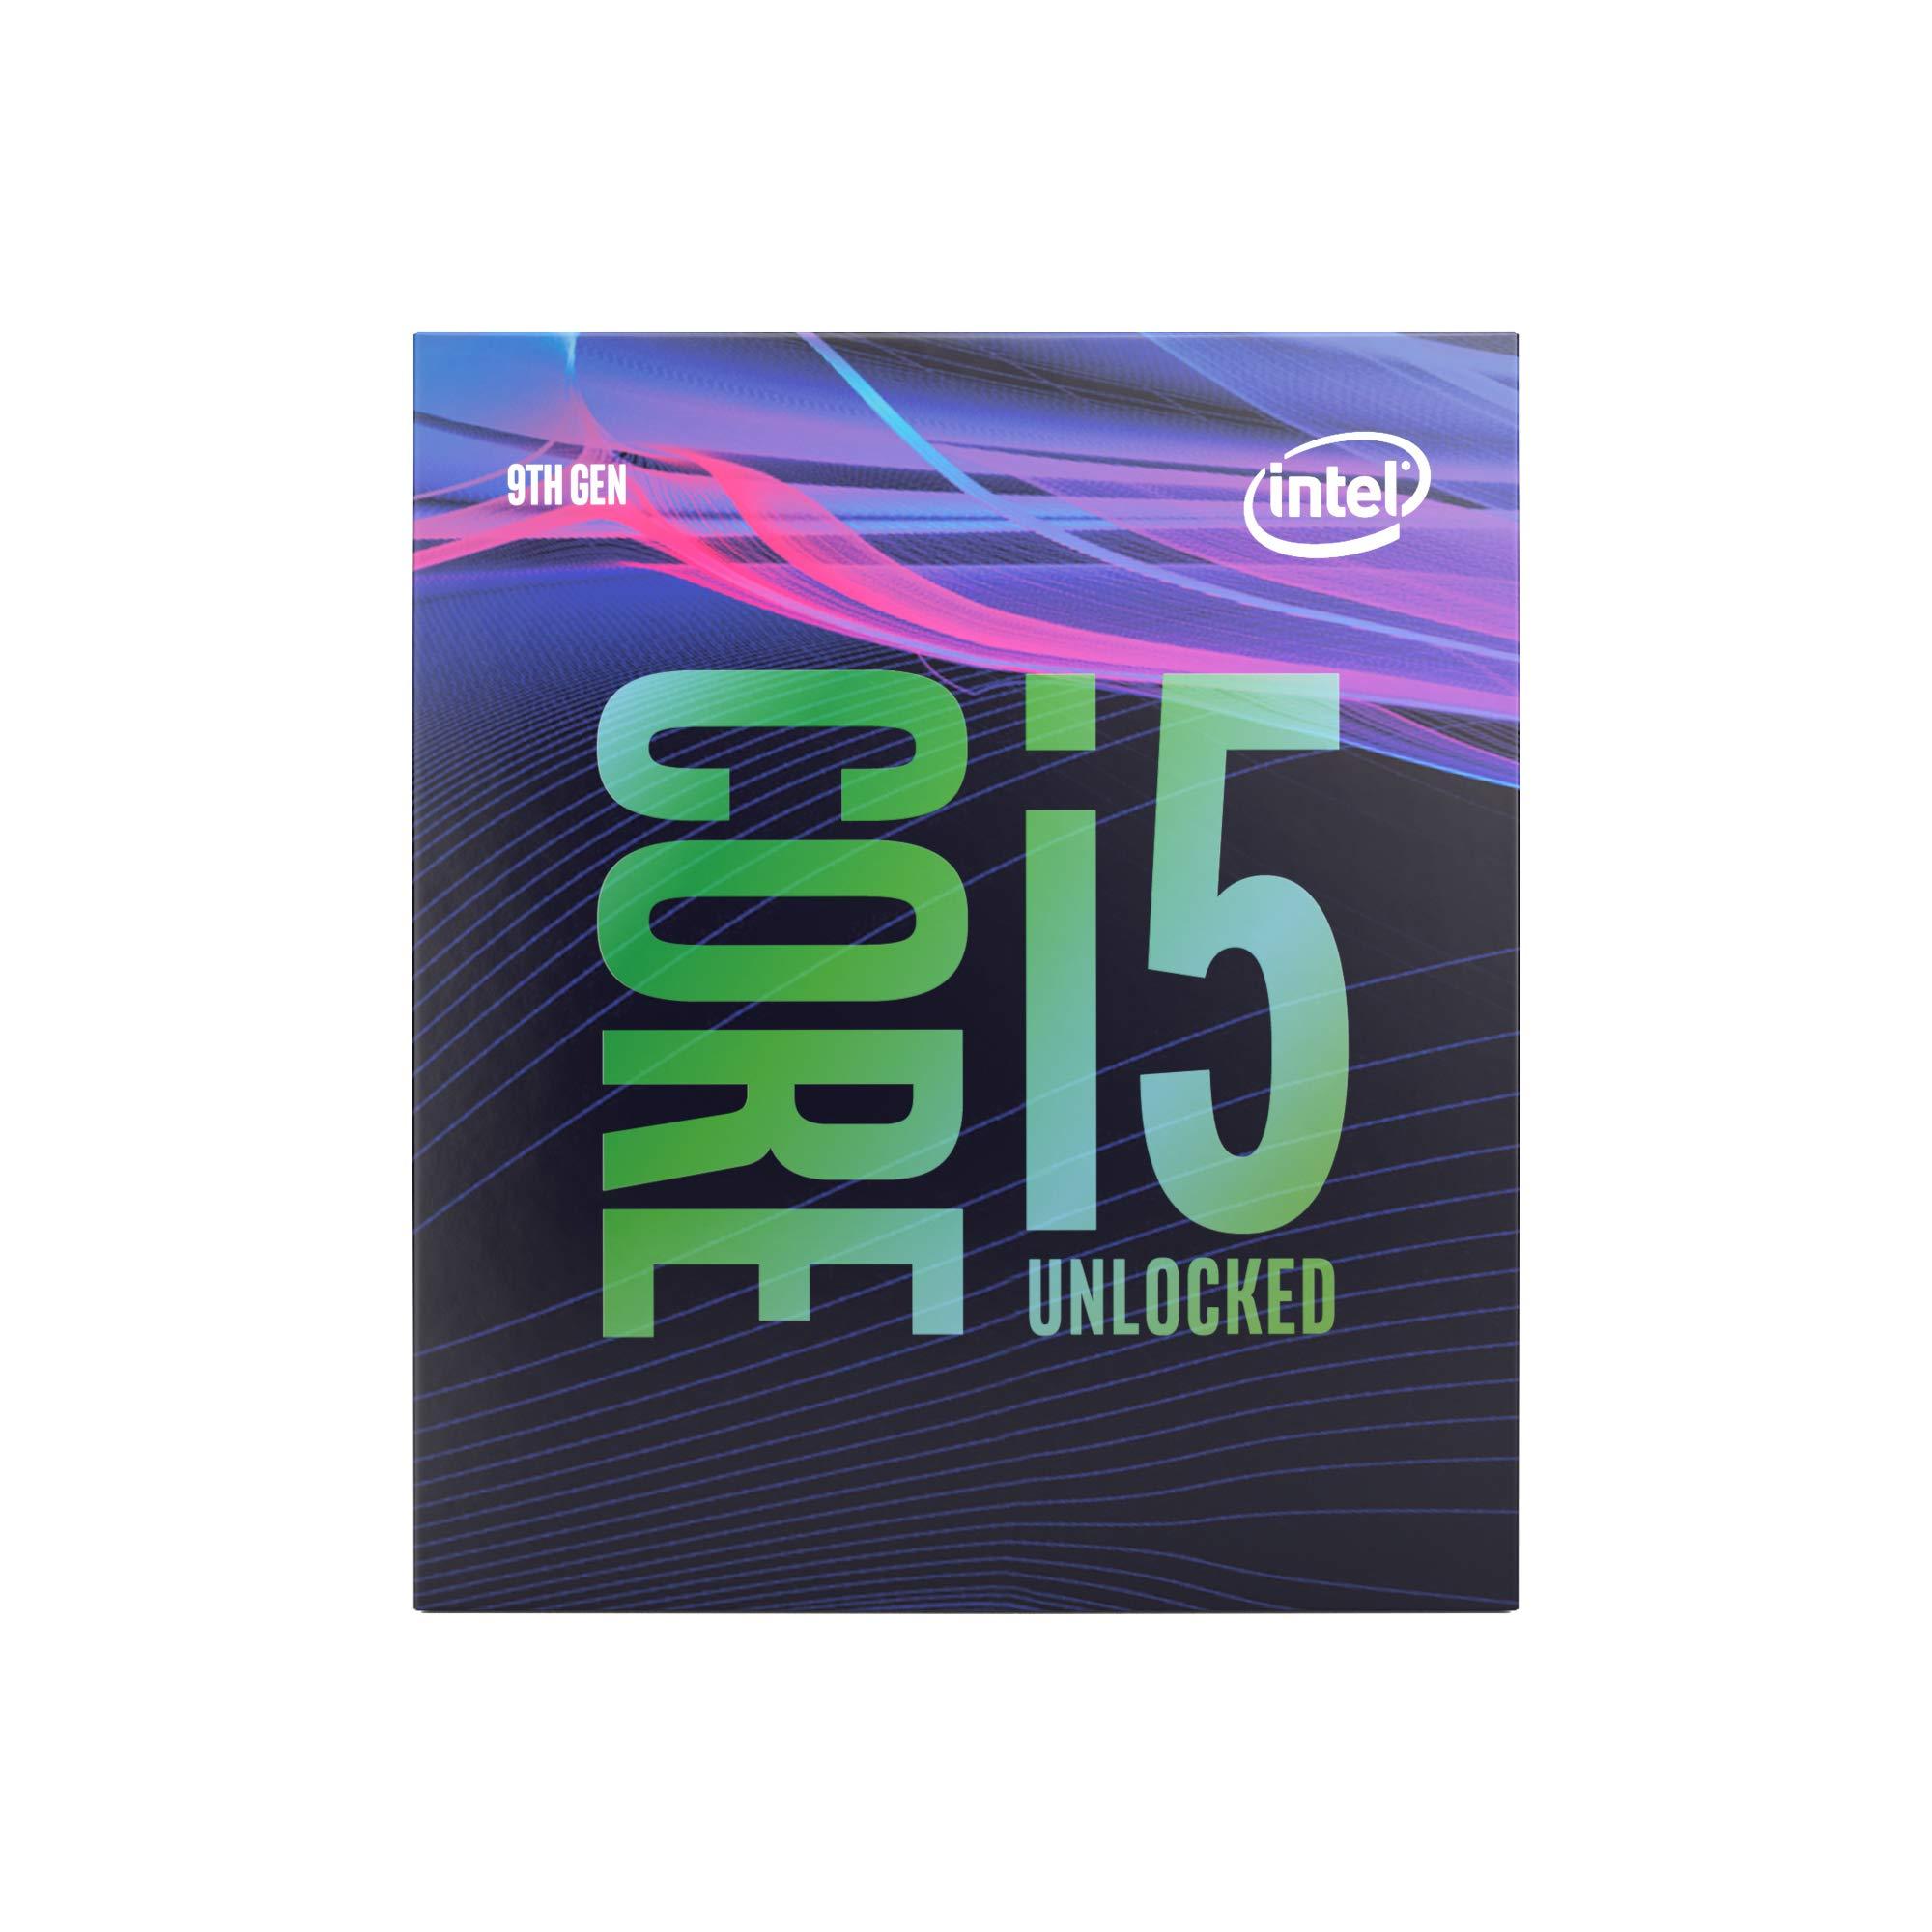 Intel Core i5-9600K Desktop Processor 6 Cores up to 4.6 GHz Turbo Unlocked LGA1151 300 Series 95W by Intel (Image #1)